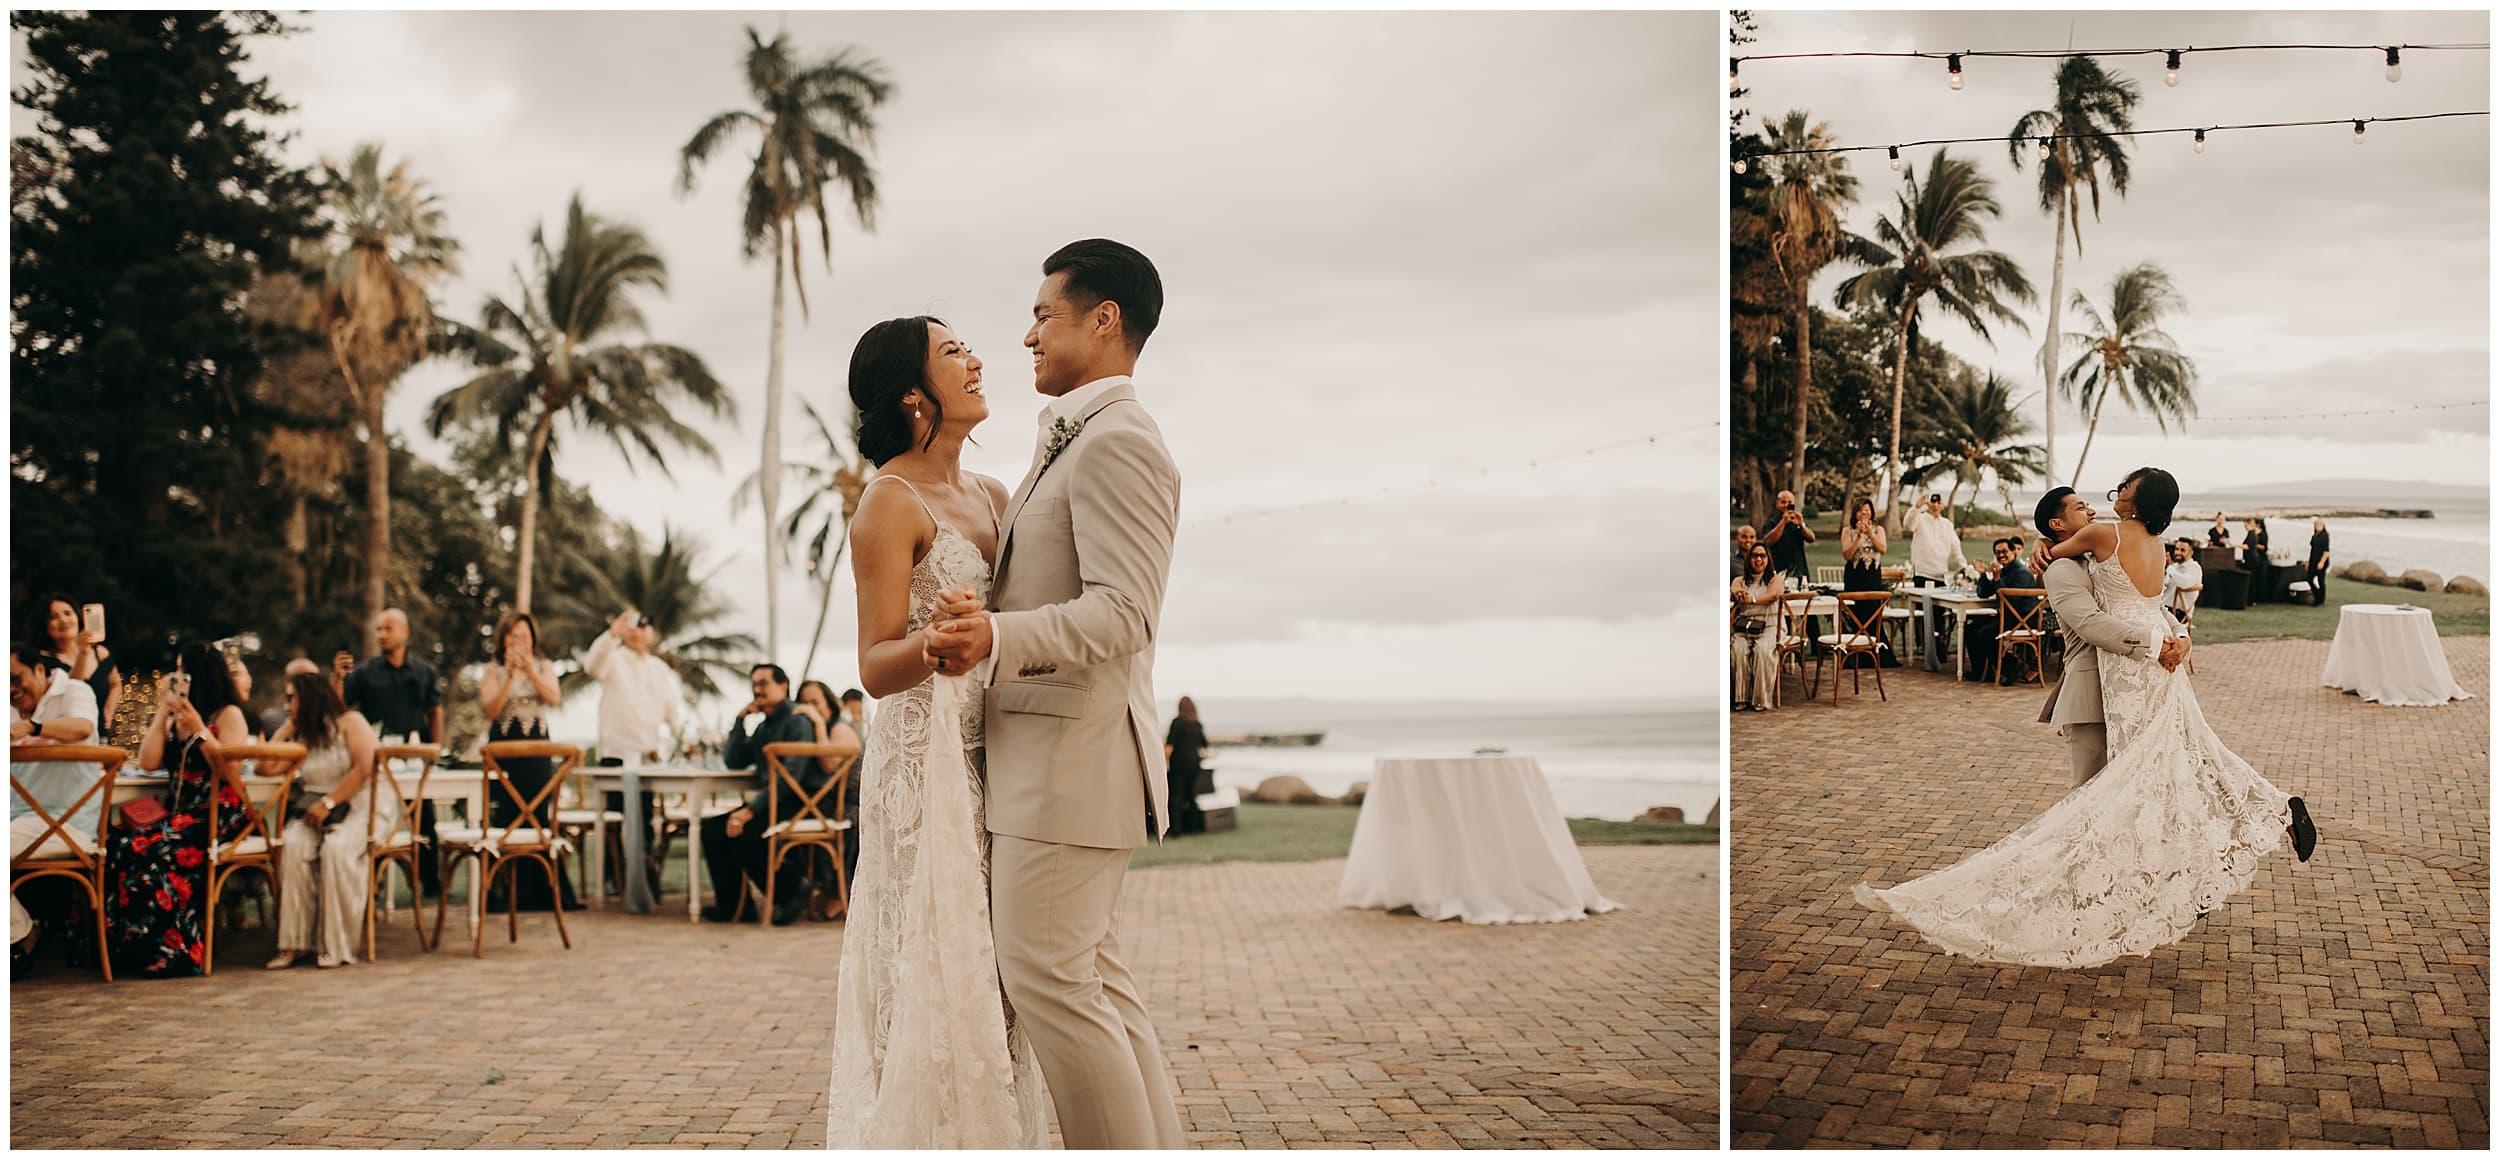 Maui wedding photography-10-11_0053